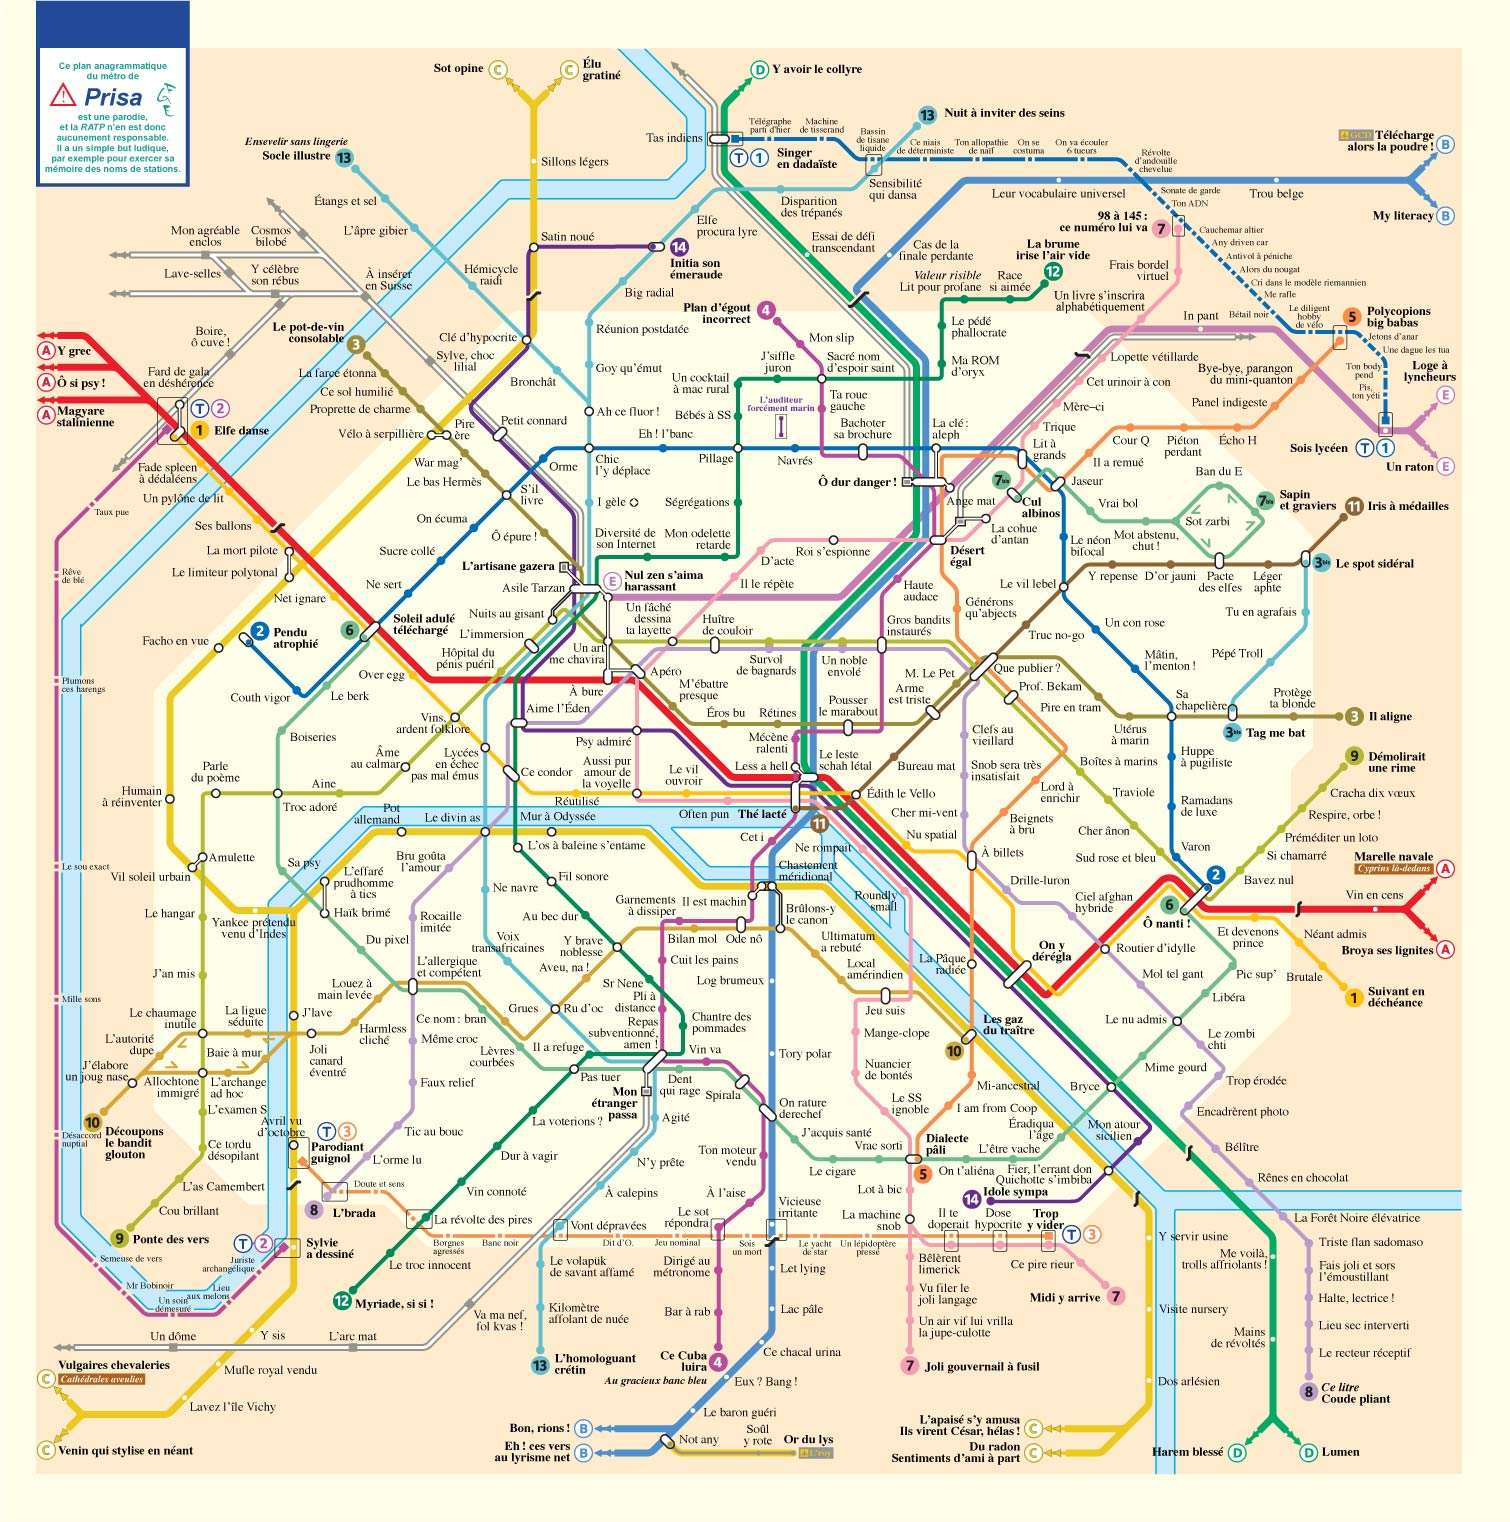 Métro parisien anagrammatisé